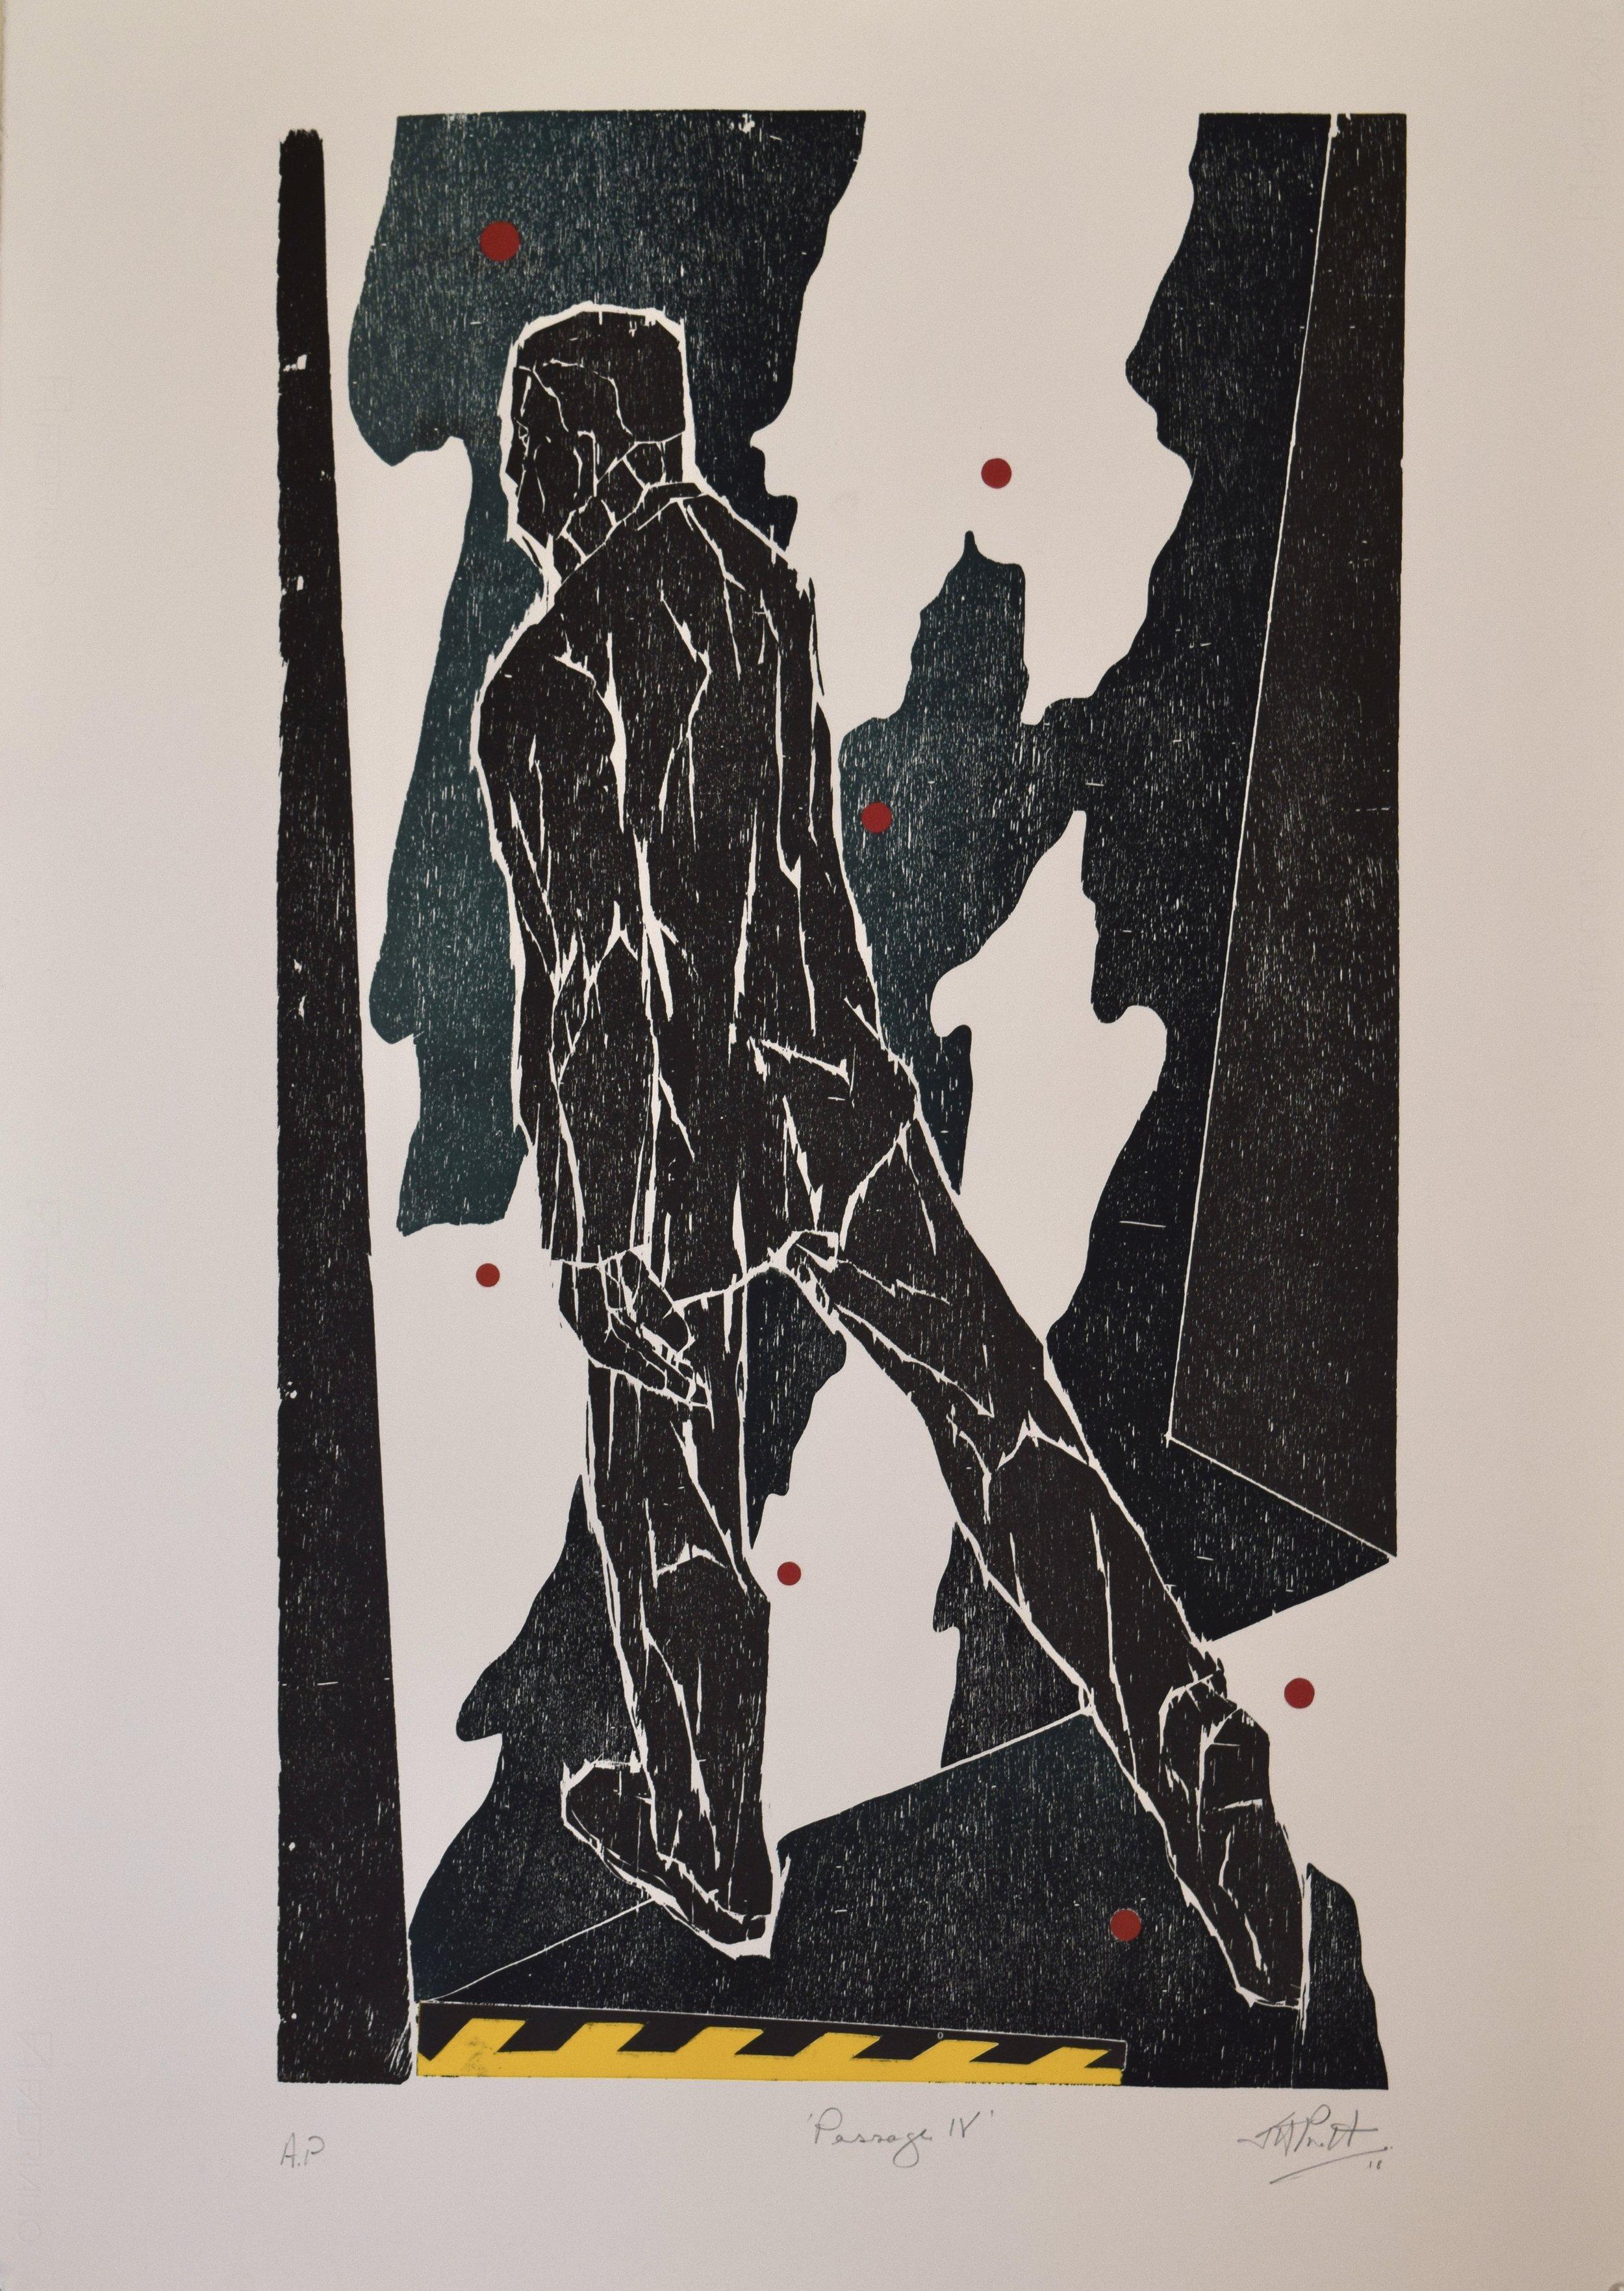 Passage IV , John Pratt, woodcut/collage, 2018